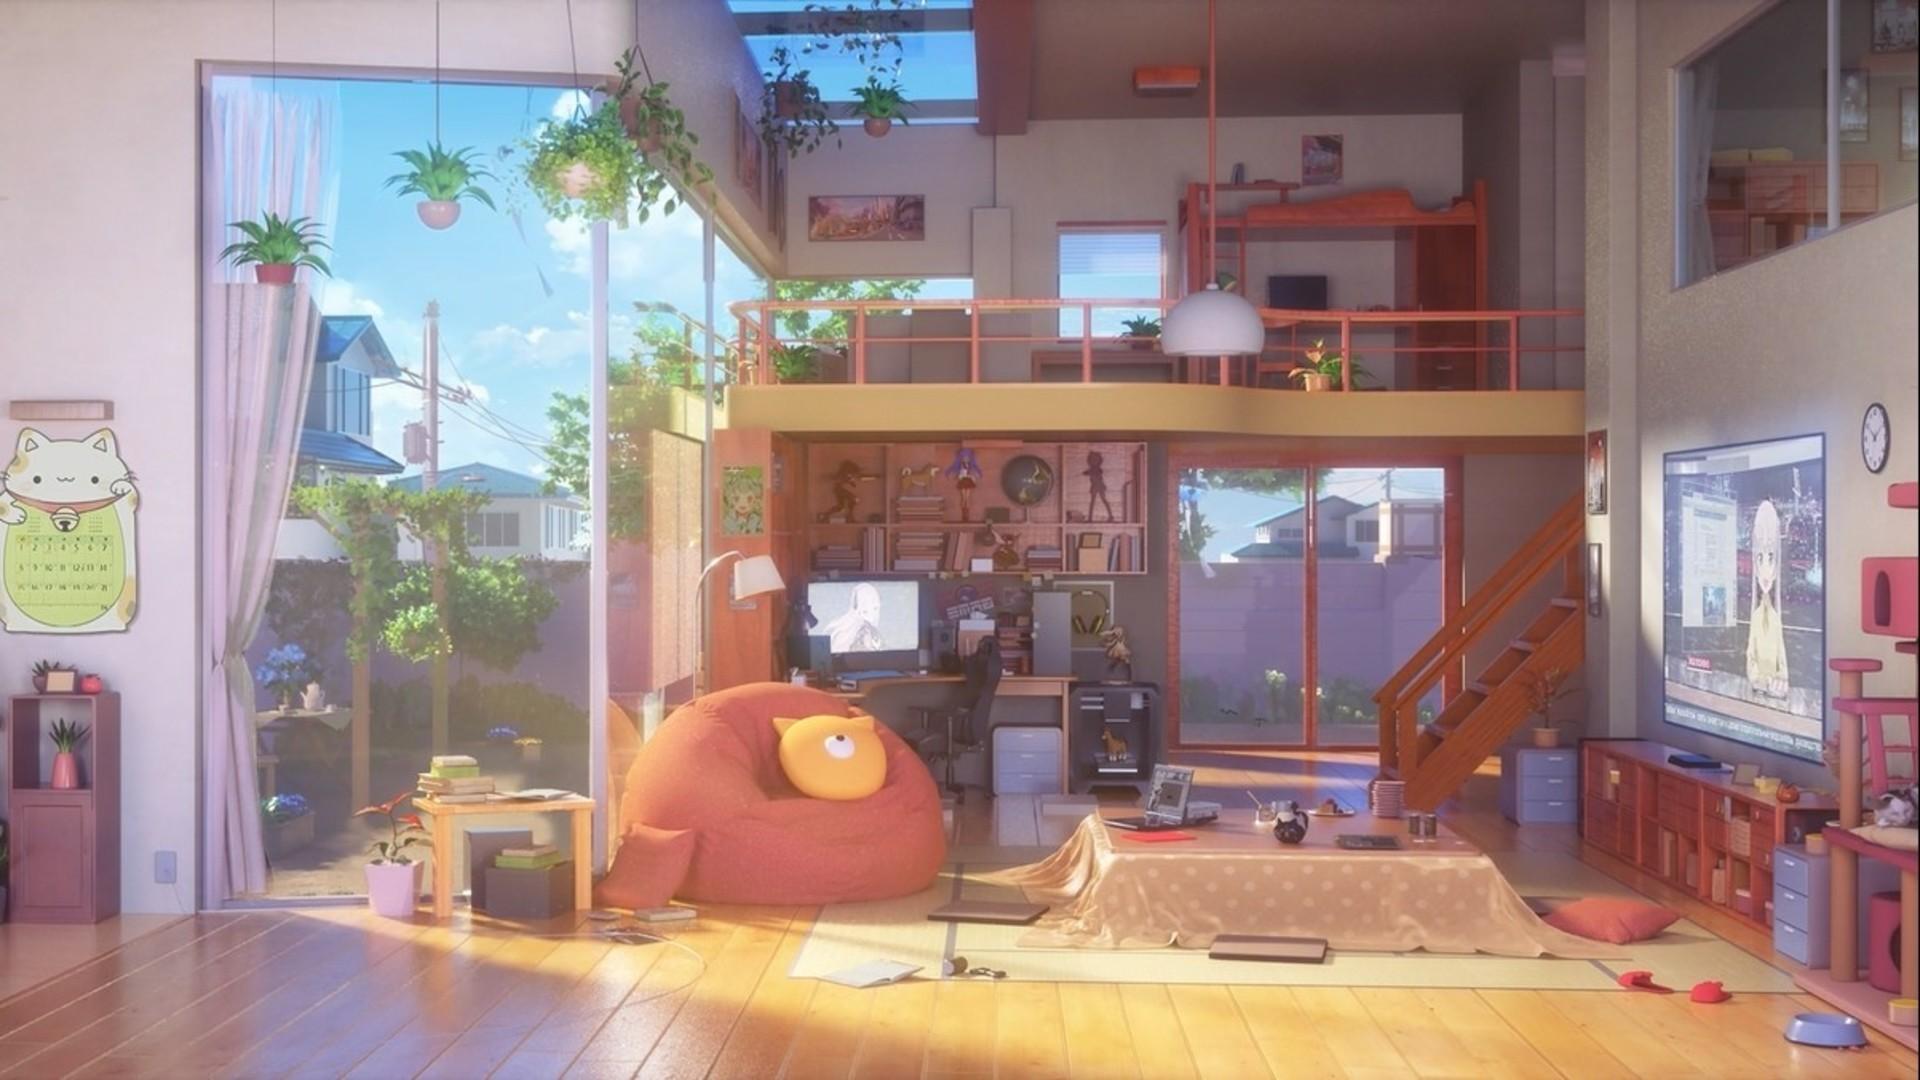 Anime Bedroom Wallpaper image hd